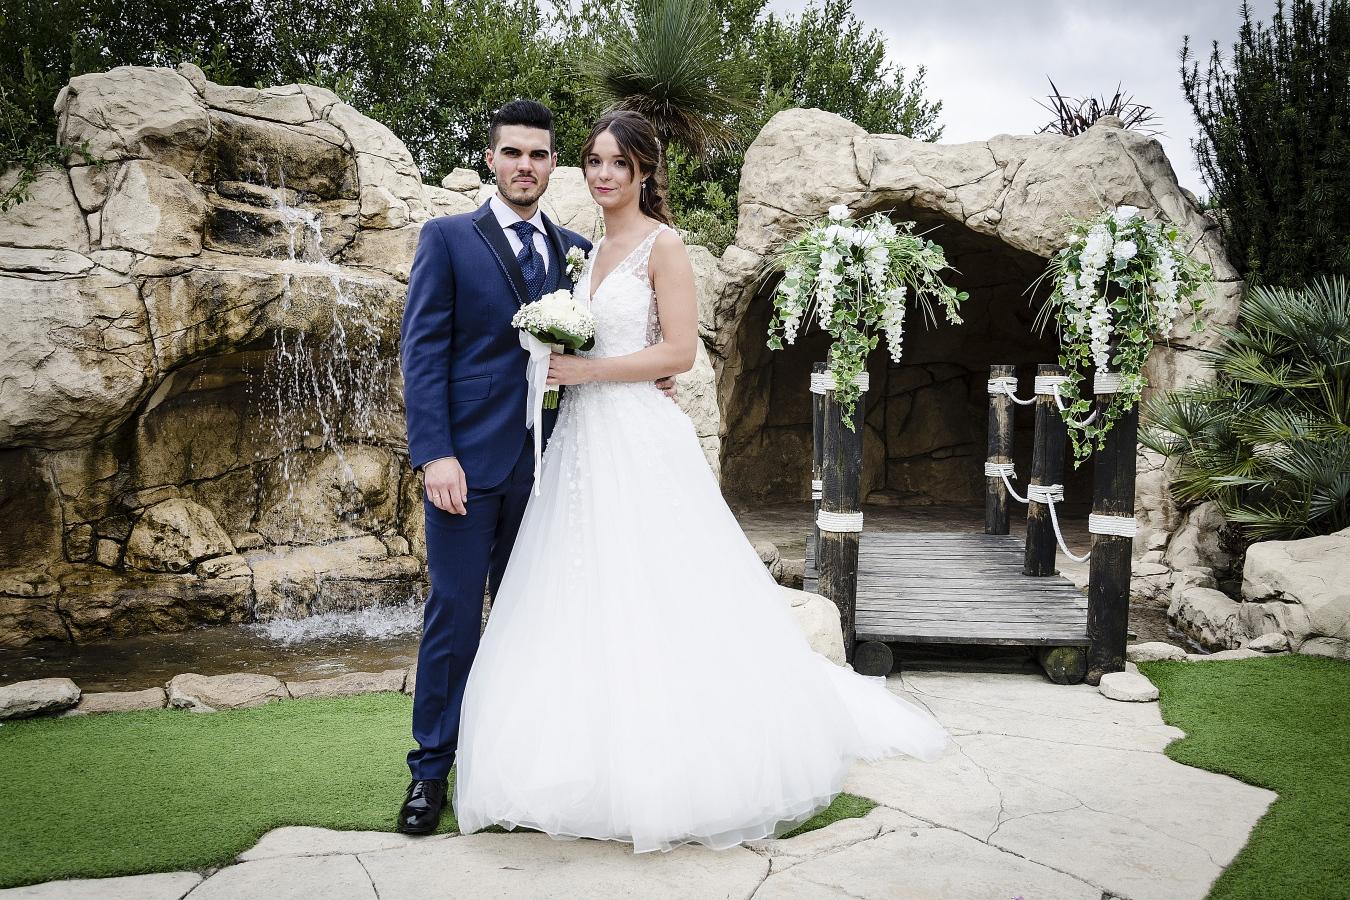 Bodas - javier del ser fotografia bodas comuniones